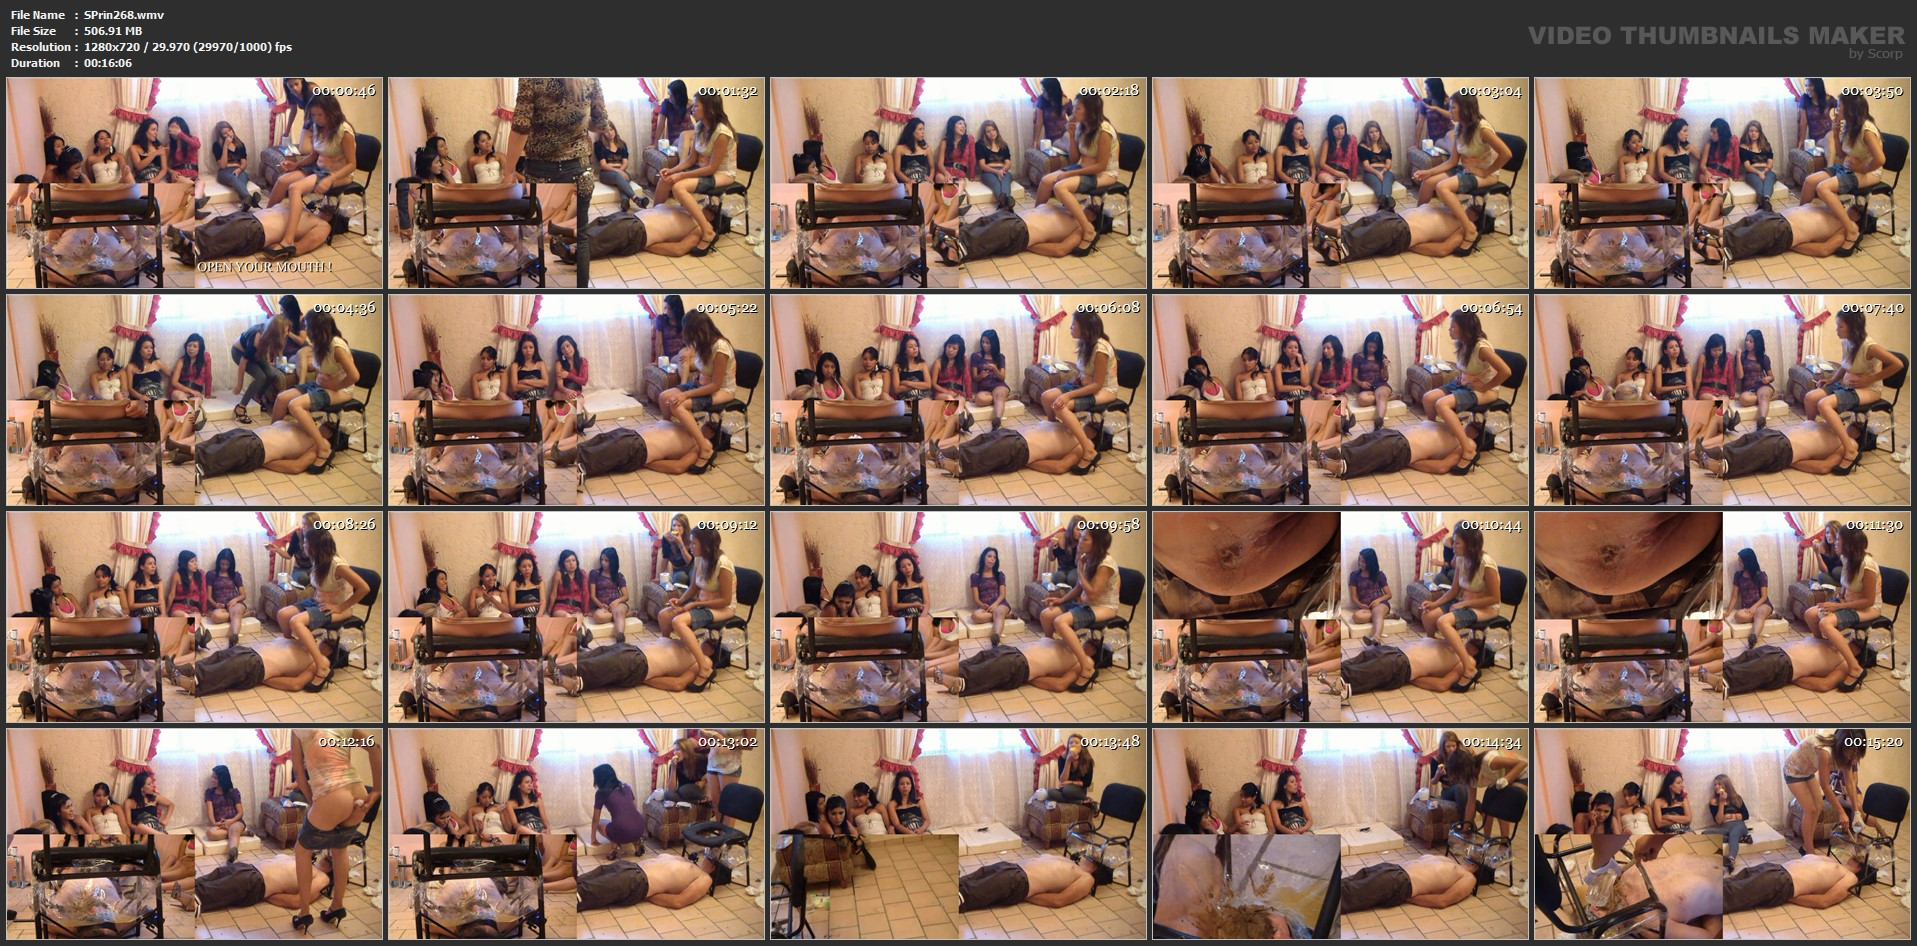 [SCAT-PRINCESS] New irristible Toilet Chair Part 04 Christina [HD][720p][WMV]